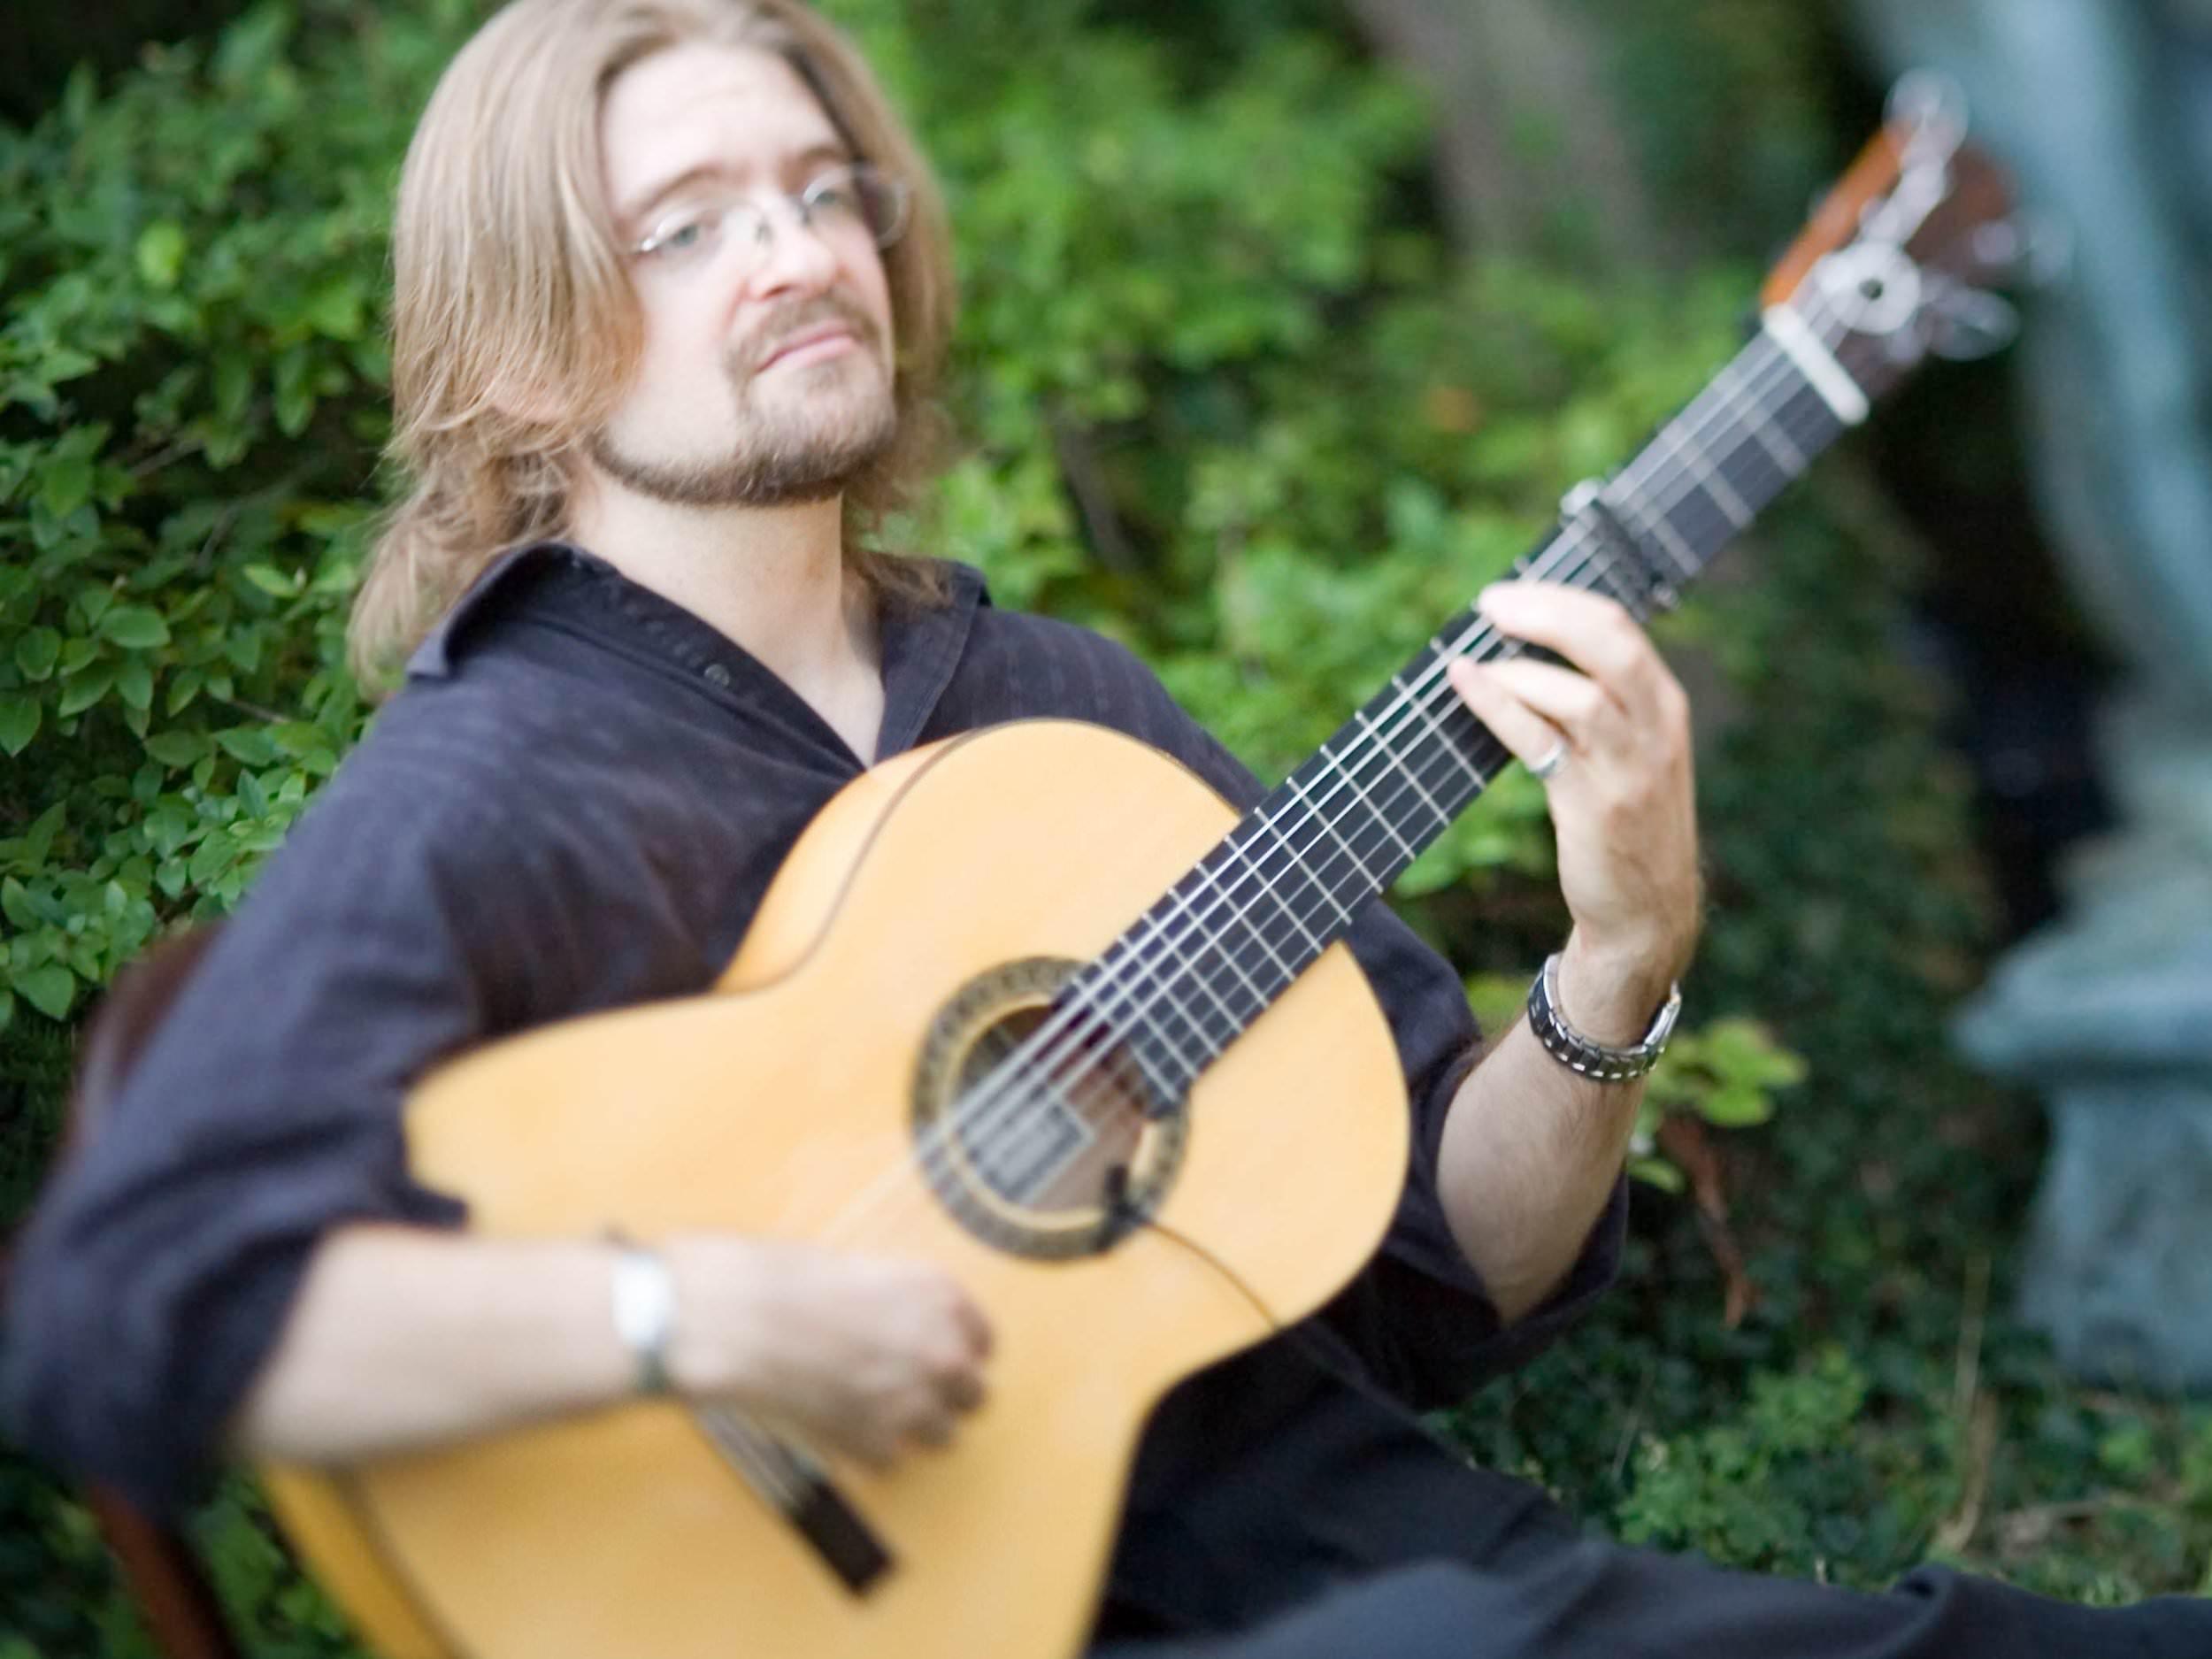 flamenco-spanish-guitar-wedding-manchester-by-the-sea-ma-with-harrington-events.jpg